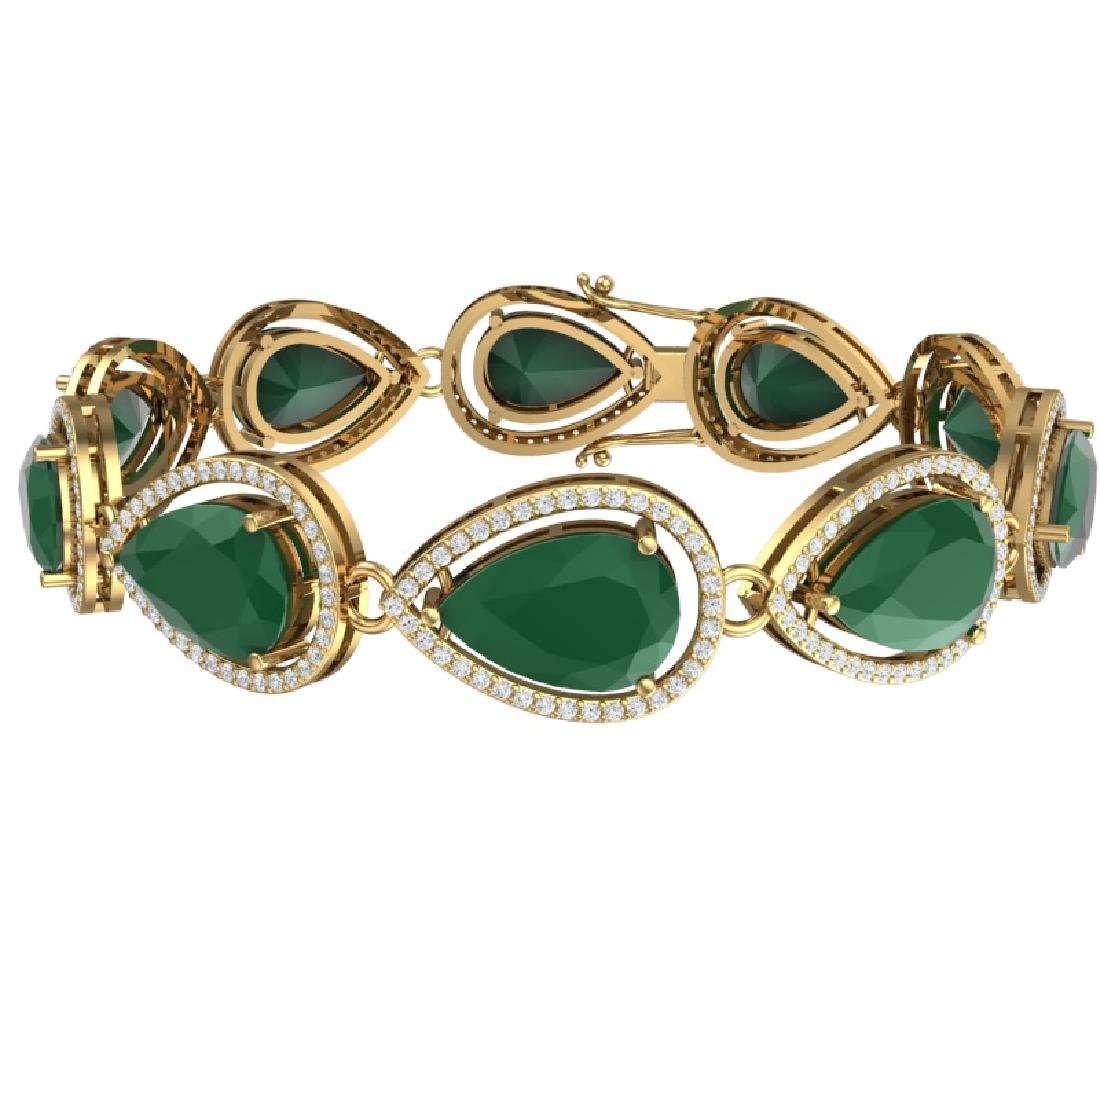 28.31 CTW Royalty Emerald & VS Diamond Bracelet 18K - 3